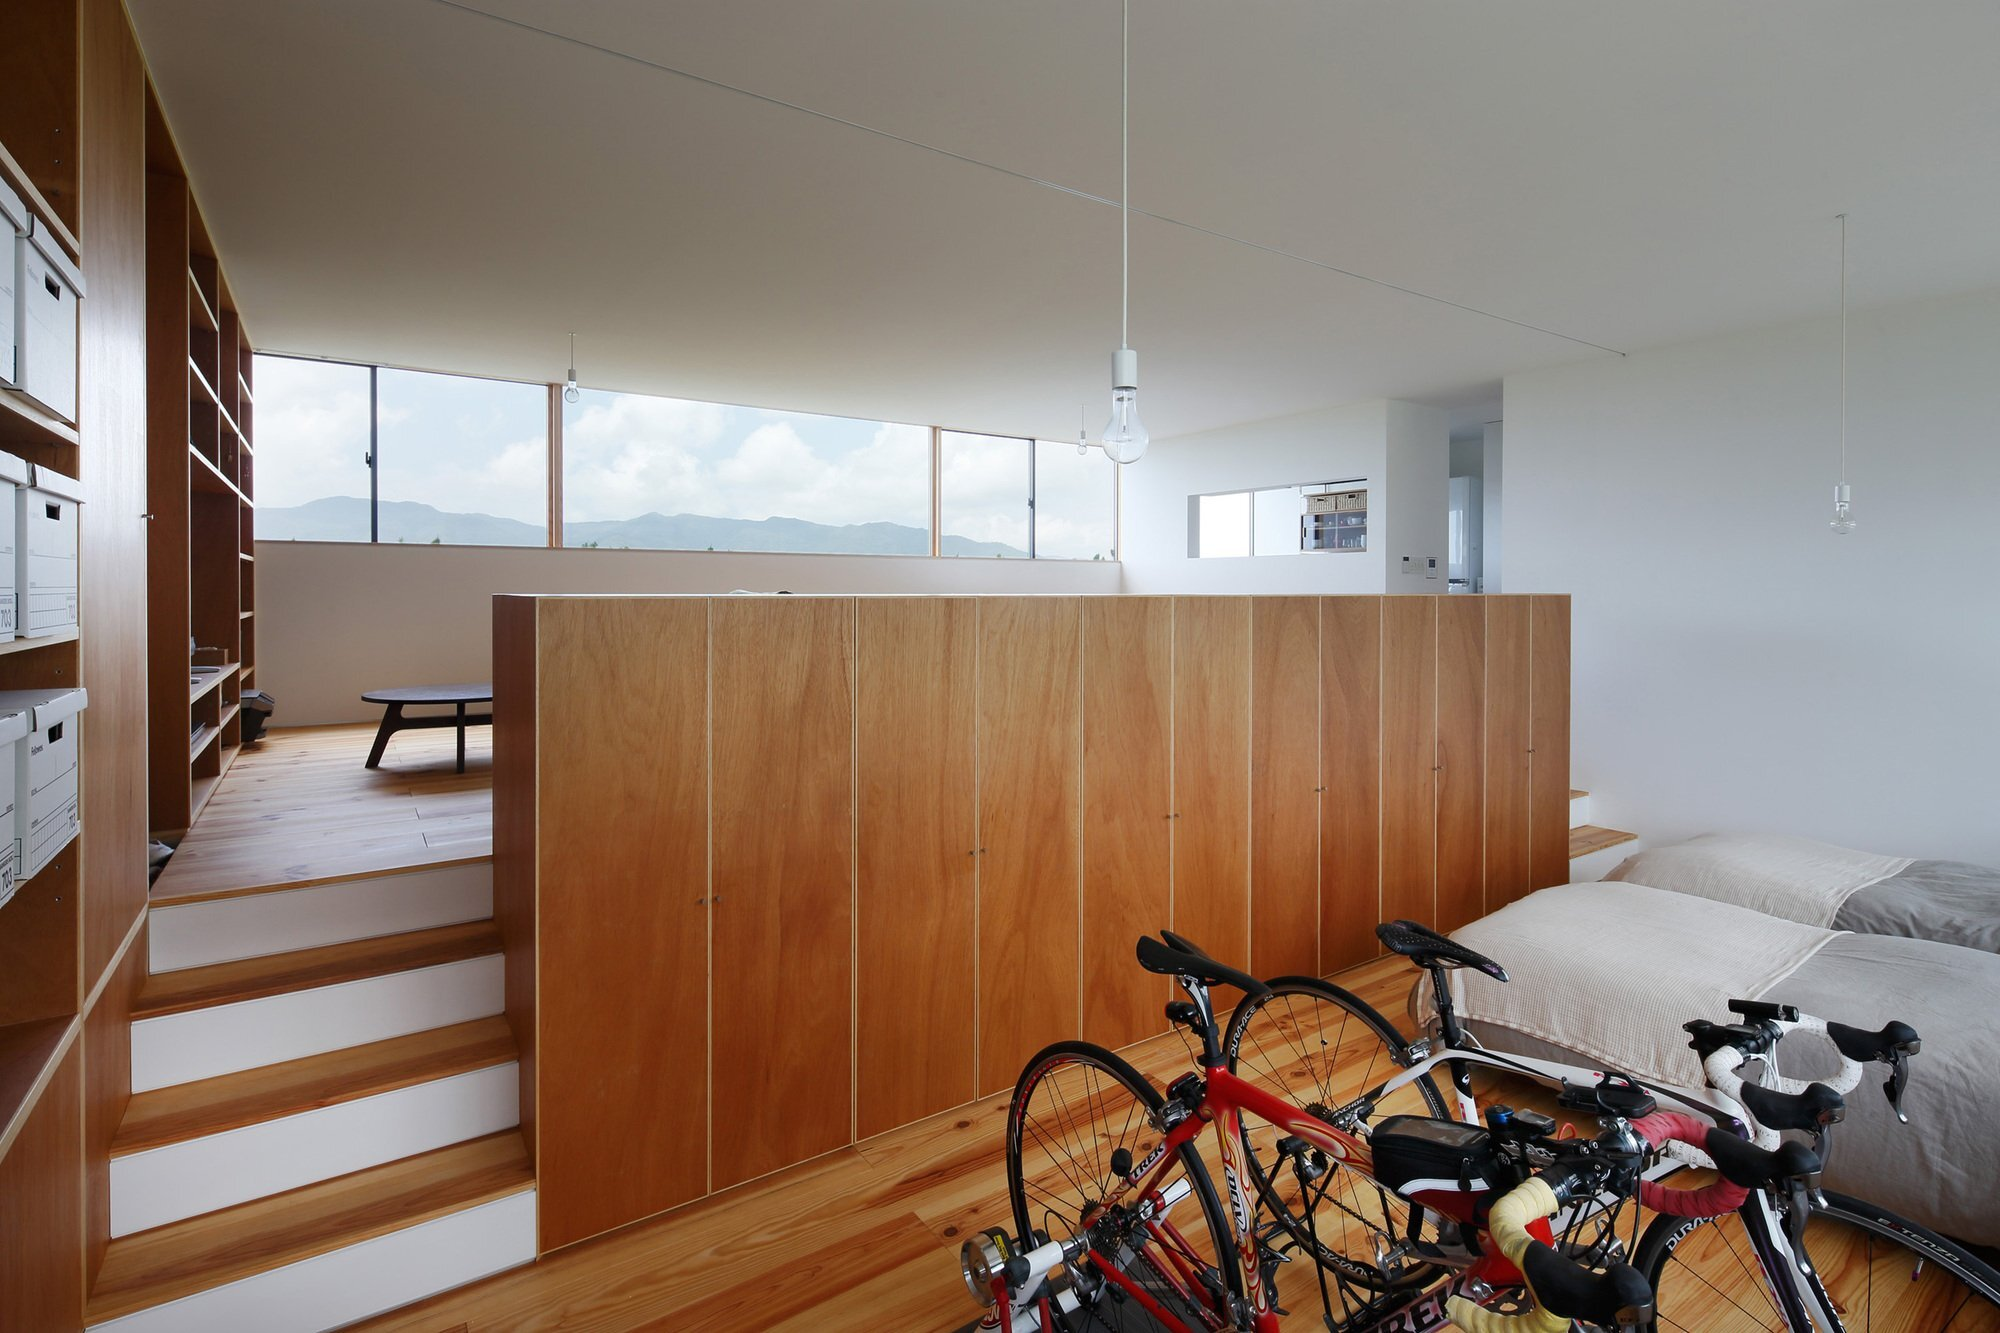 Gui House - Japanese House - Harunatsu-Arch - Shimane Japan - Bedroom - Humble Homes